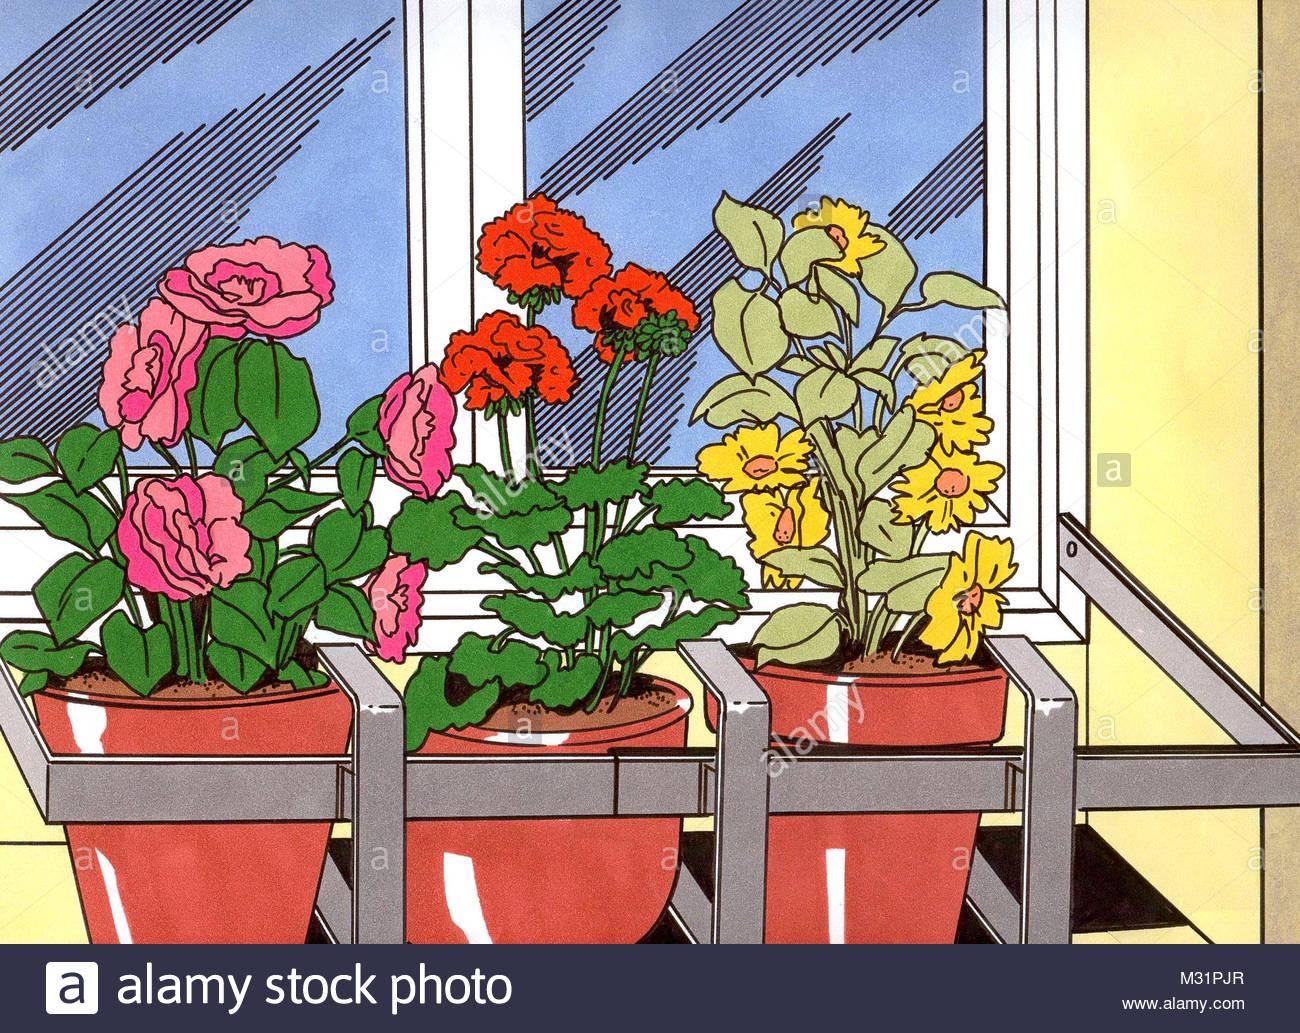 Planting flowers outside window - Stock Image